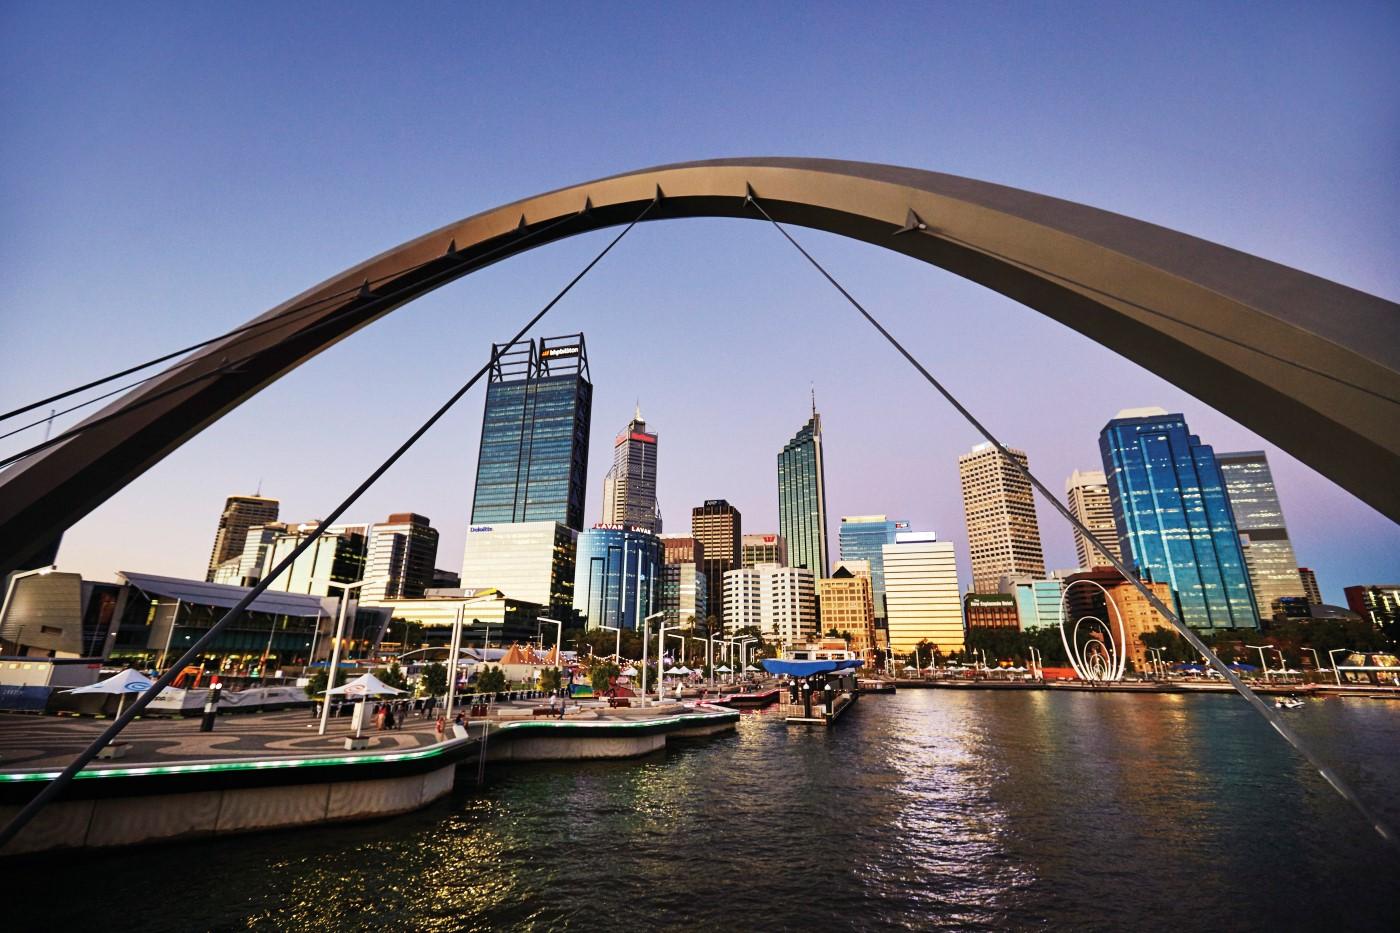 Perth skyline from the Elizabeth Quay pedestrian bridge